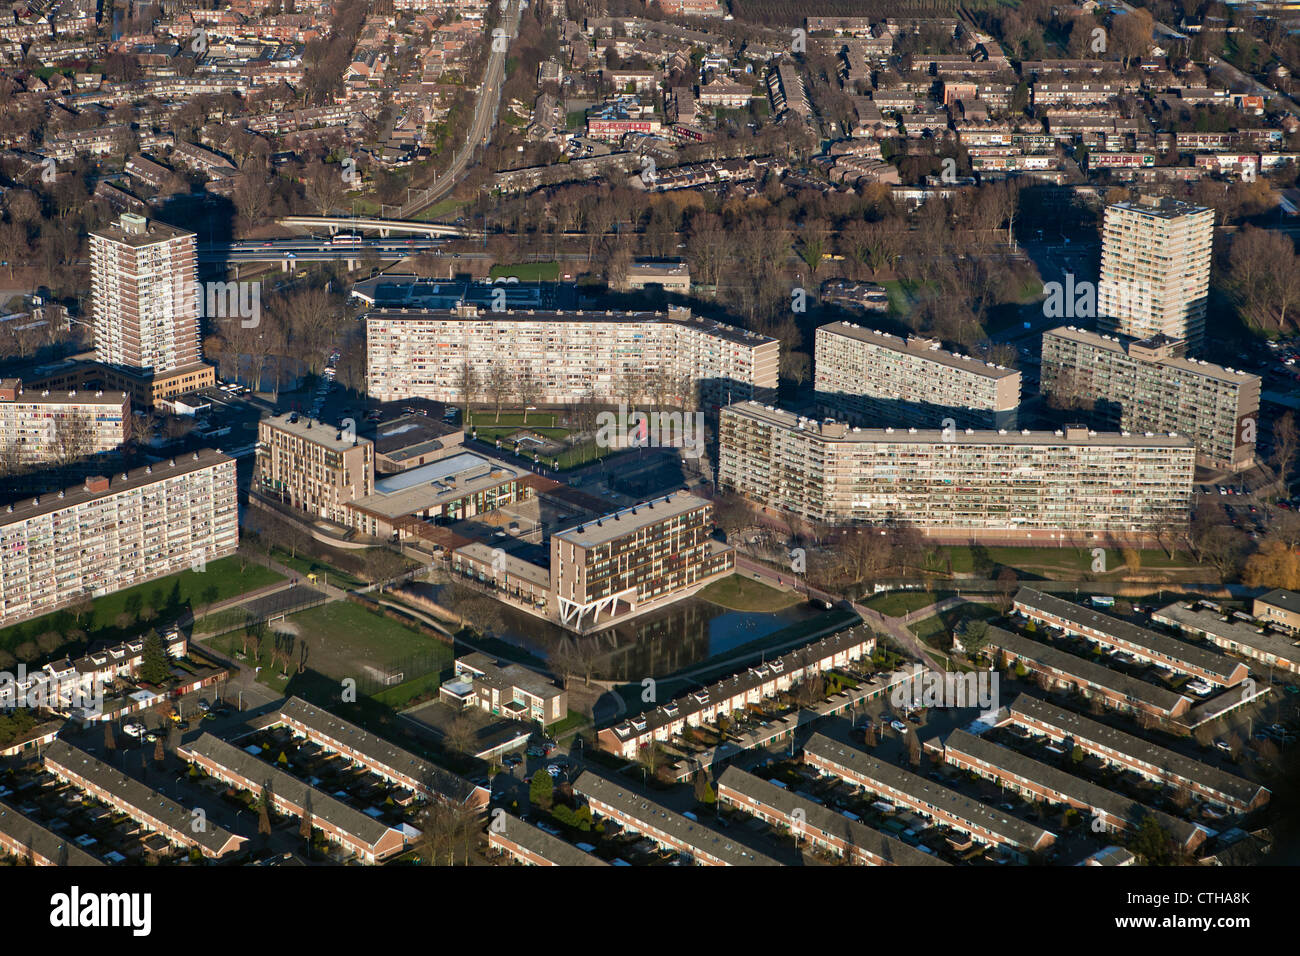 The Netherlands, Zoetermeer, City. Aerial. Apartment buildings. - Stock Image